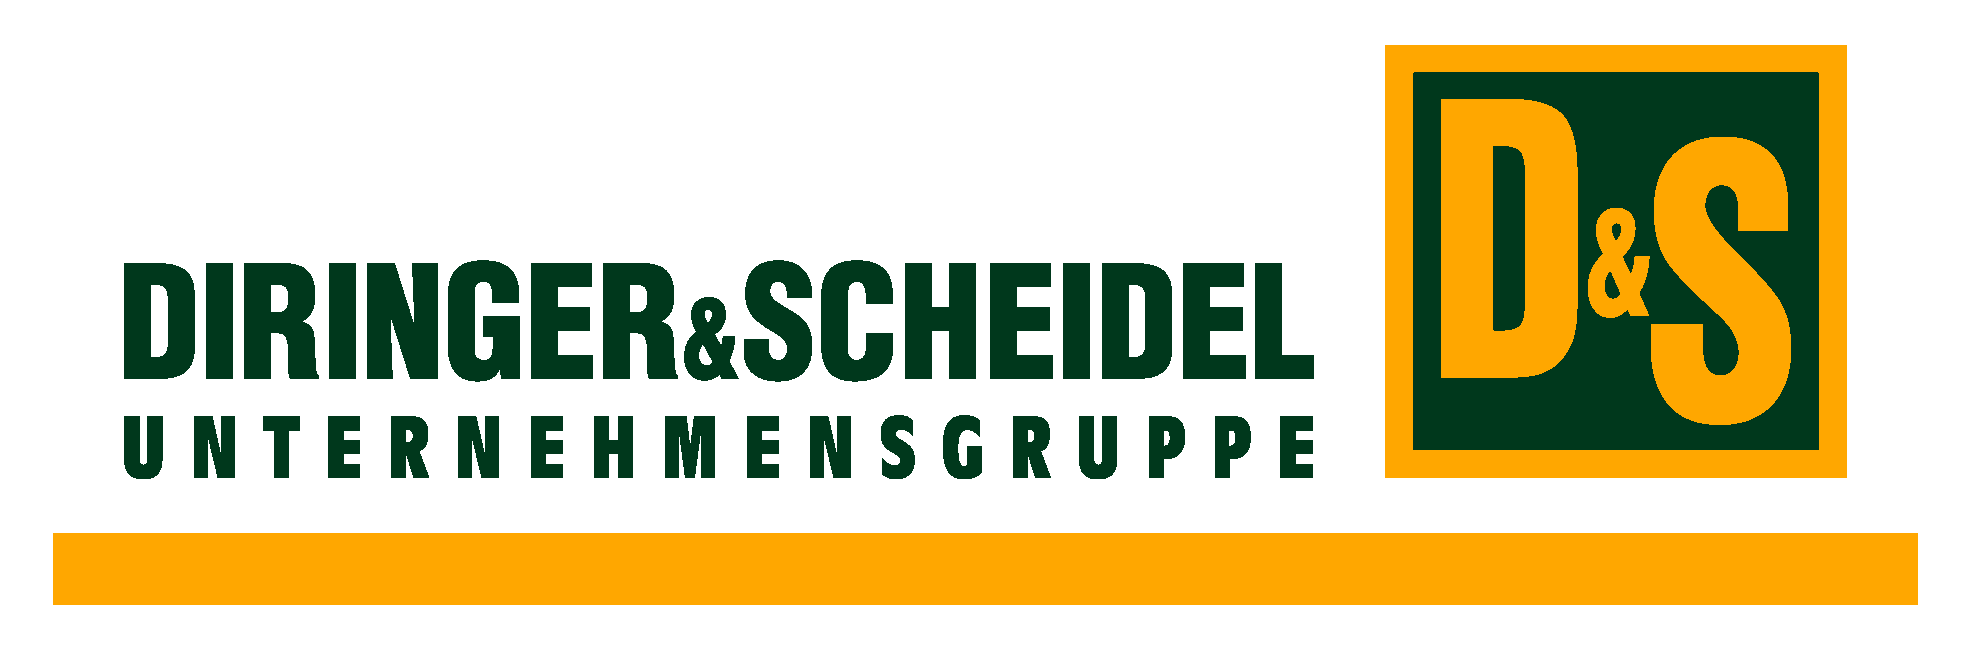 Diringer & Scheidel